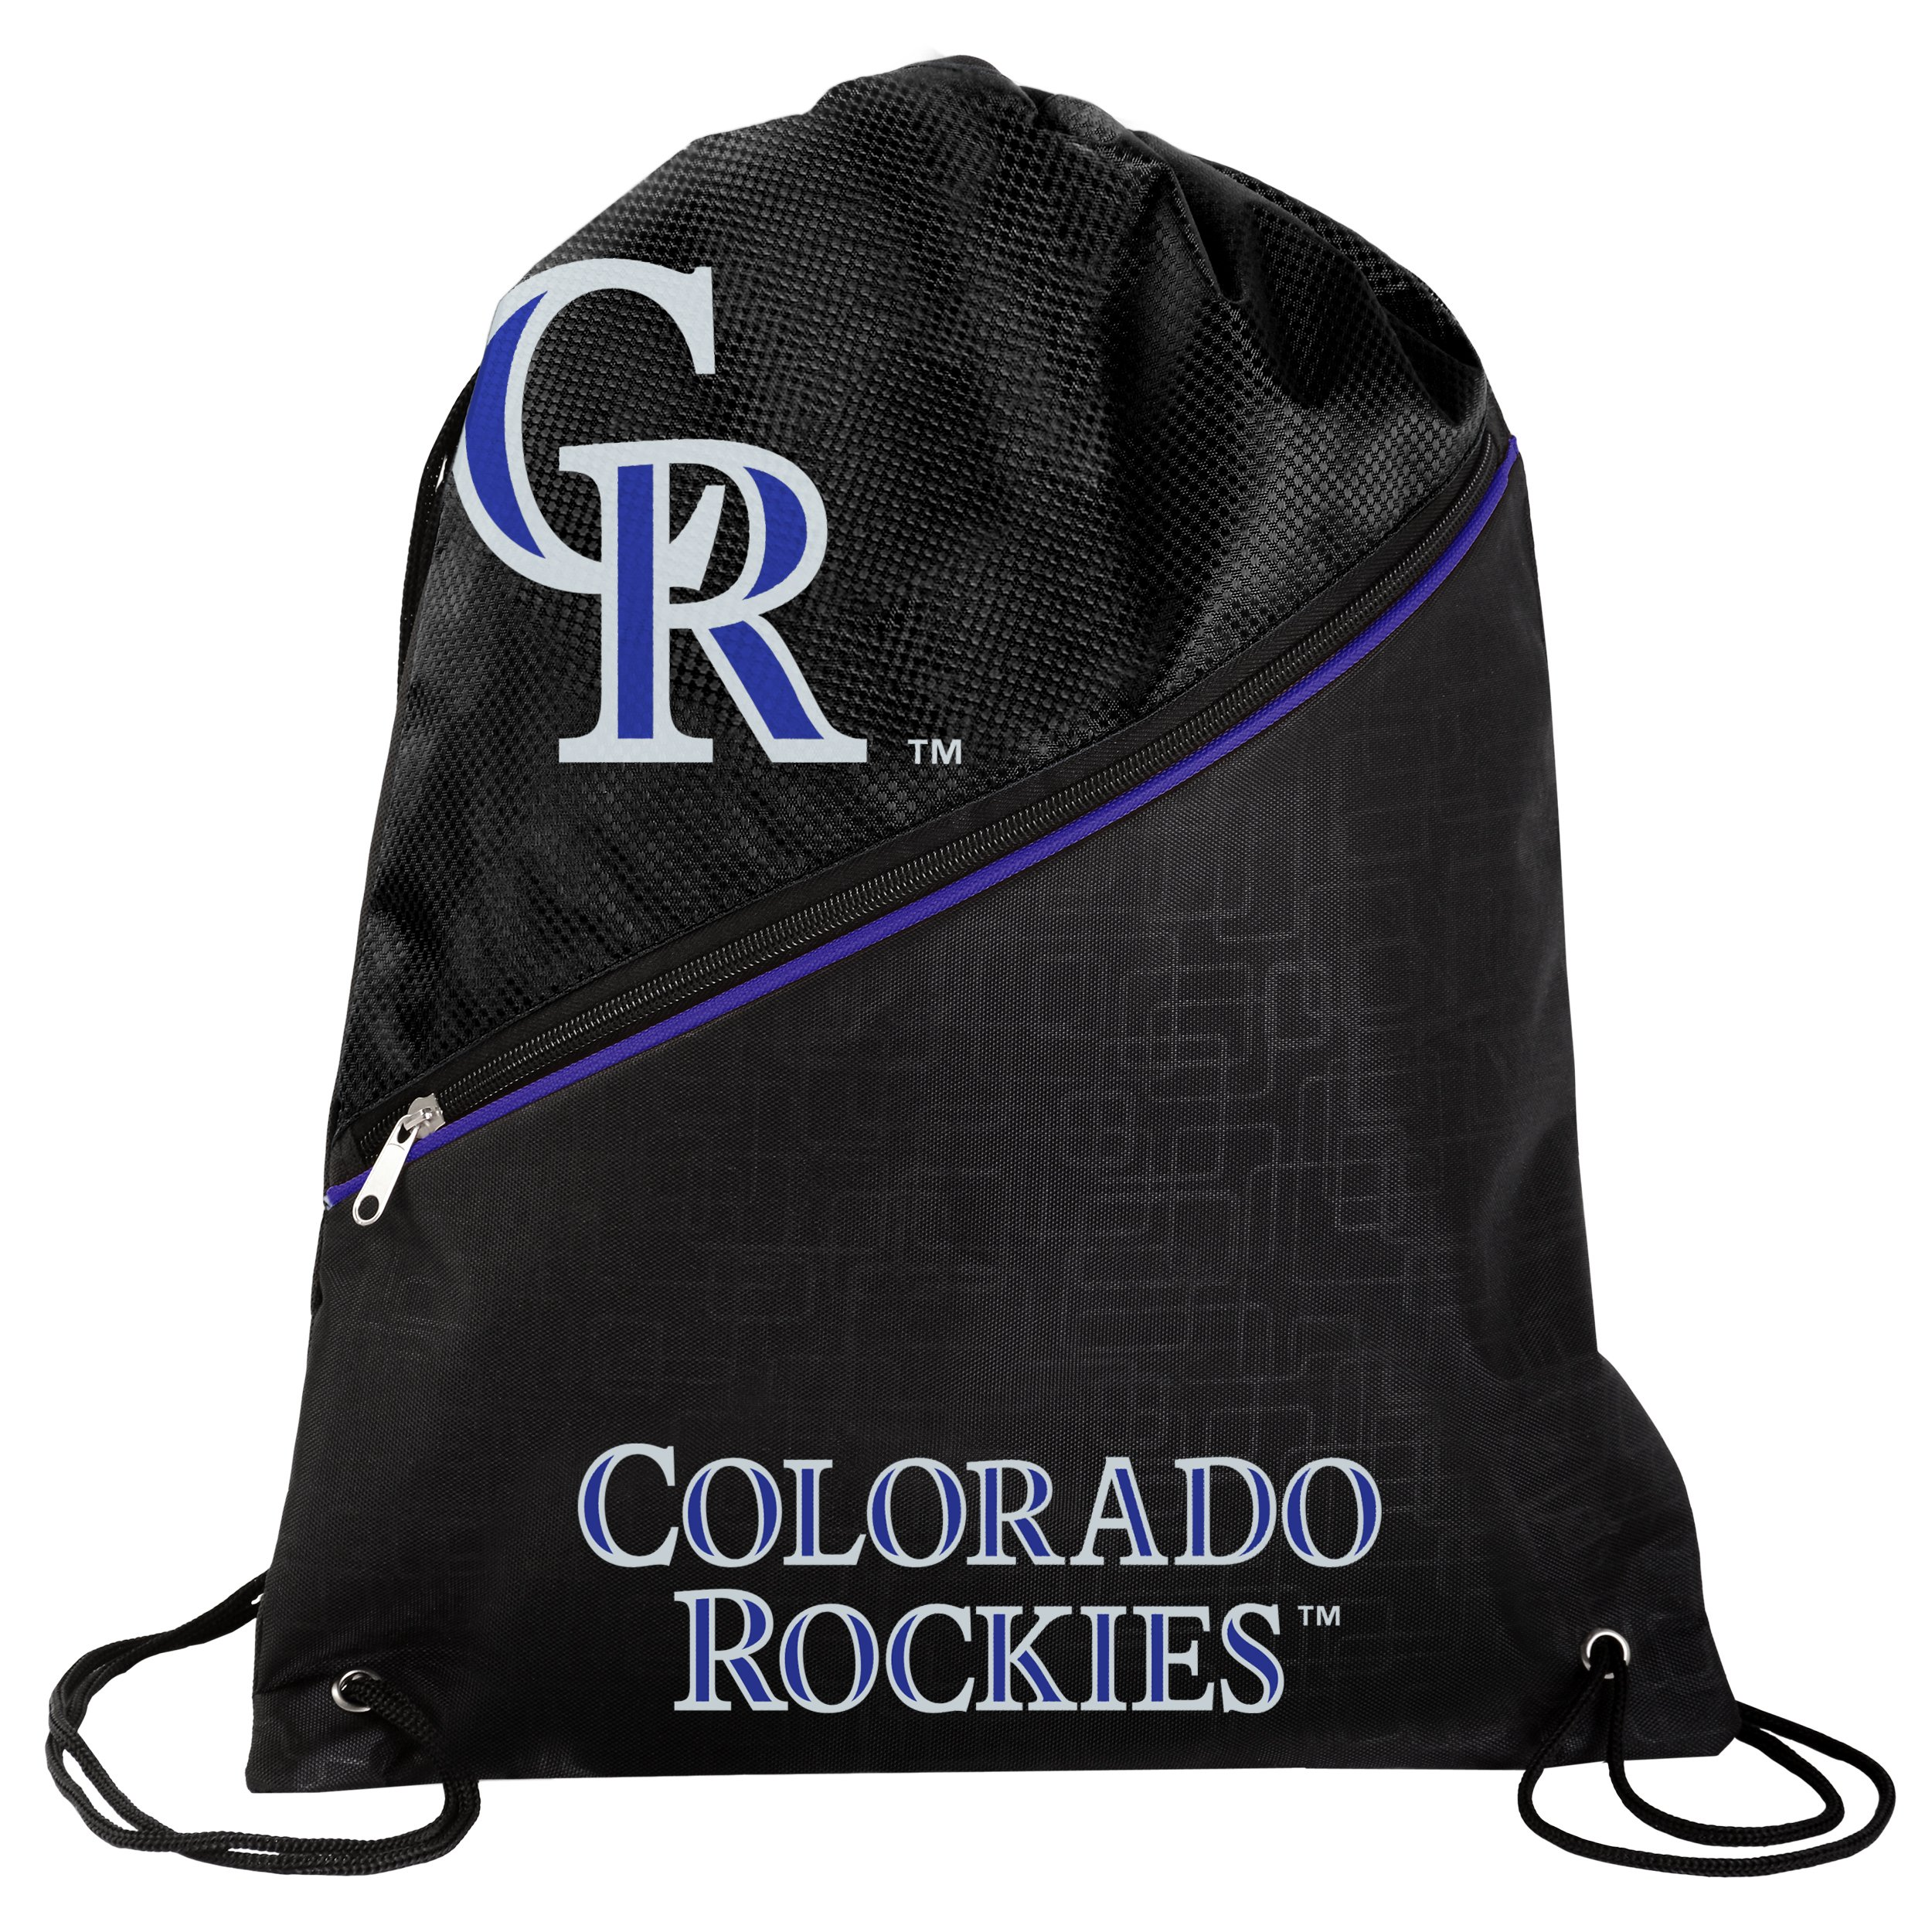 FOCO Colorado Rockies High End Diagonal Zipper Drawstring Backpack